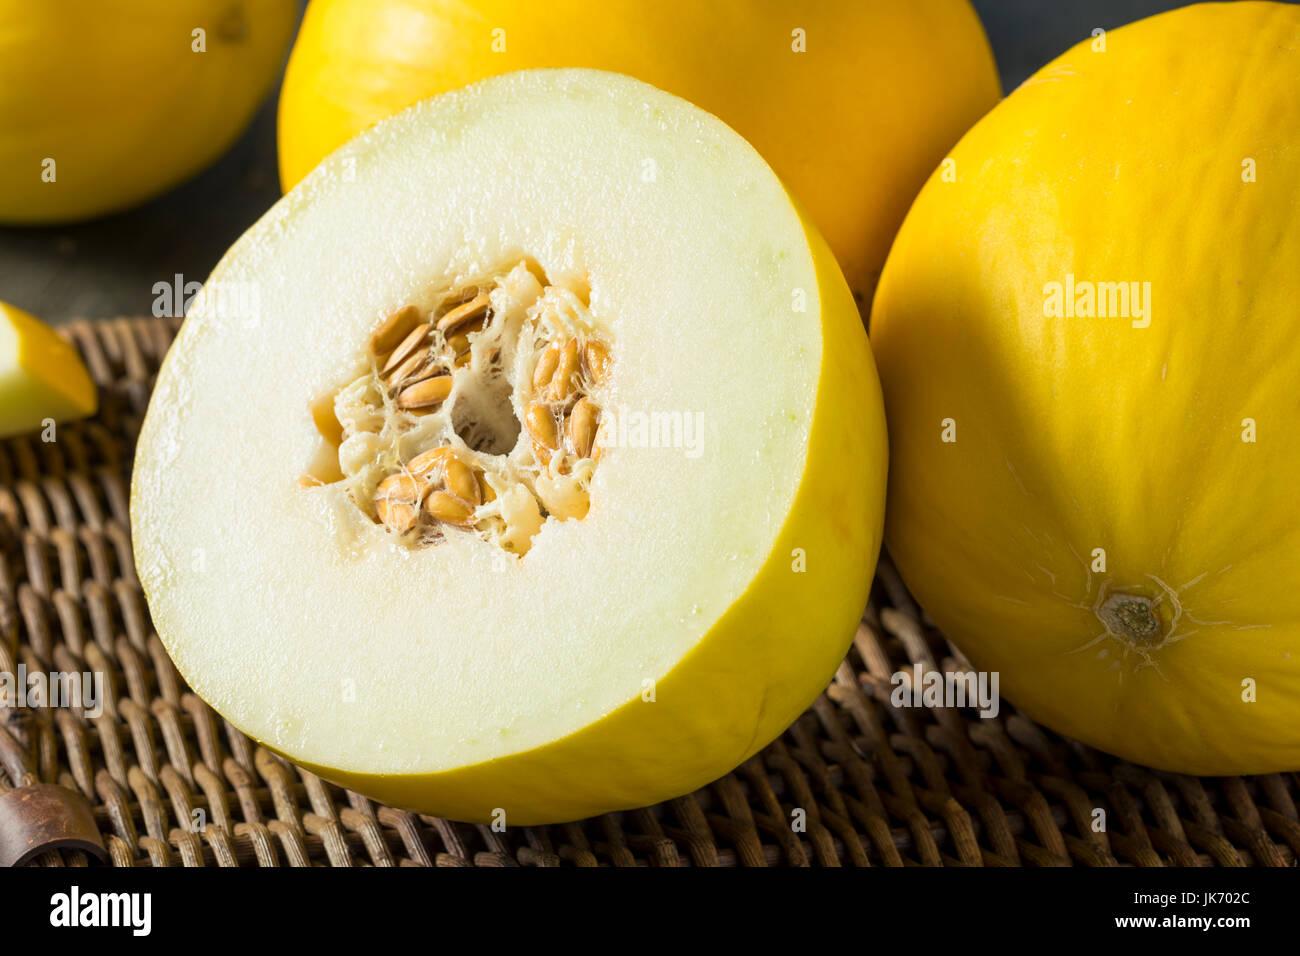 Raw Organic Yellow Honedew Melon Ready to Eat - Stock Image